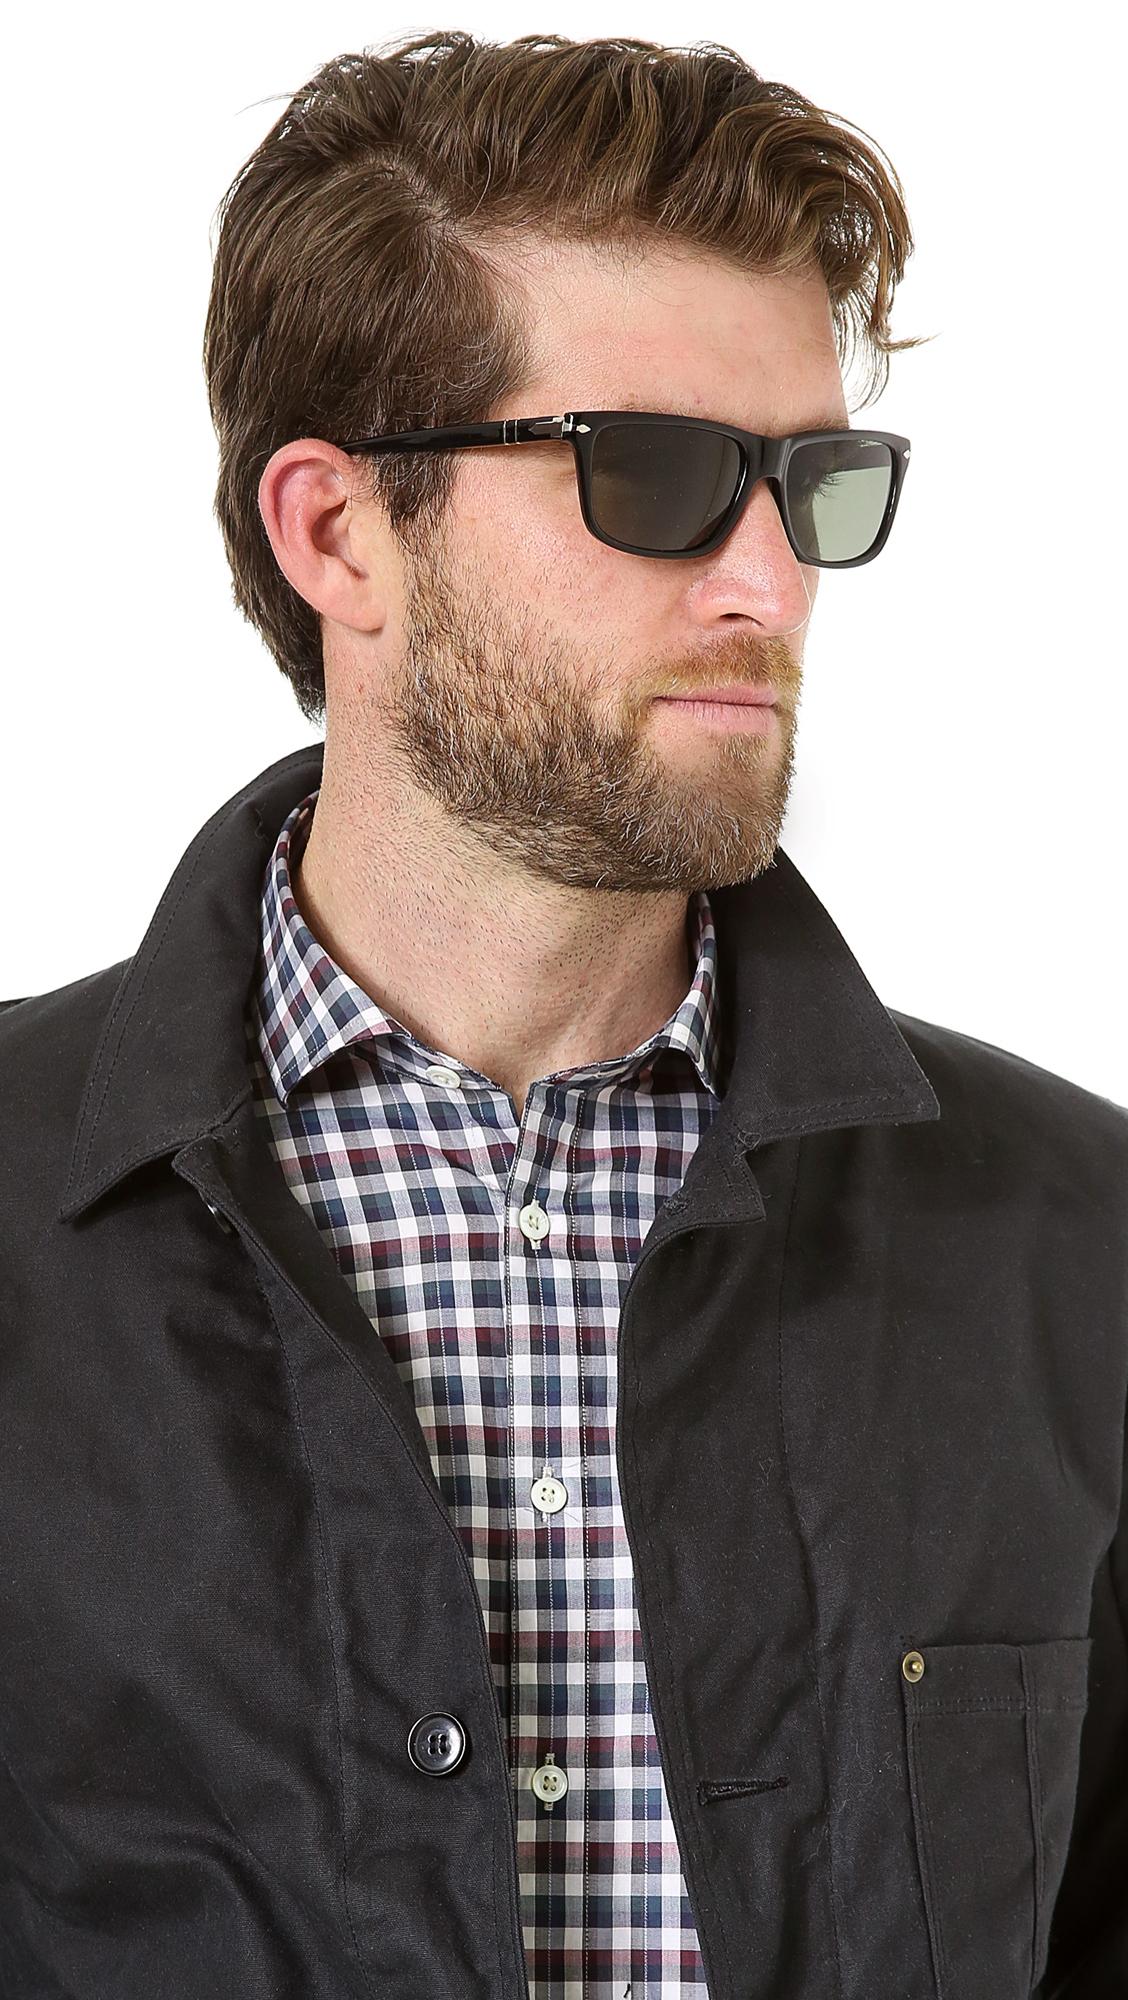 d75056d55f Lyst - Persol Rectangular Polarized Sunglasses in Black for Men